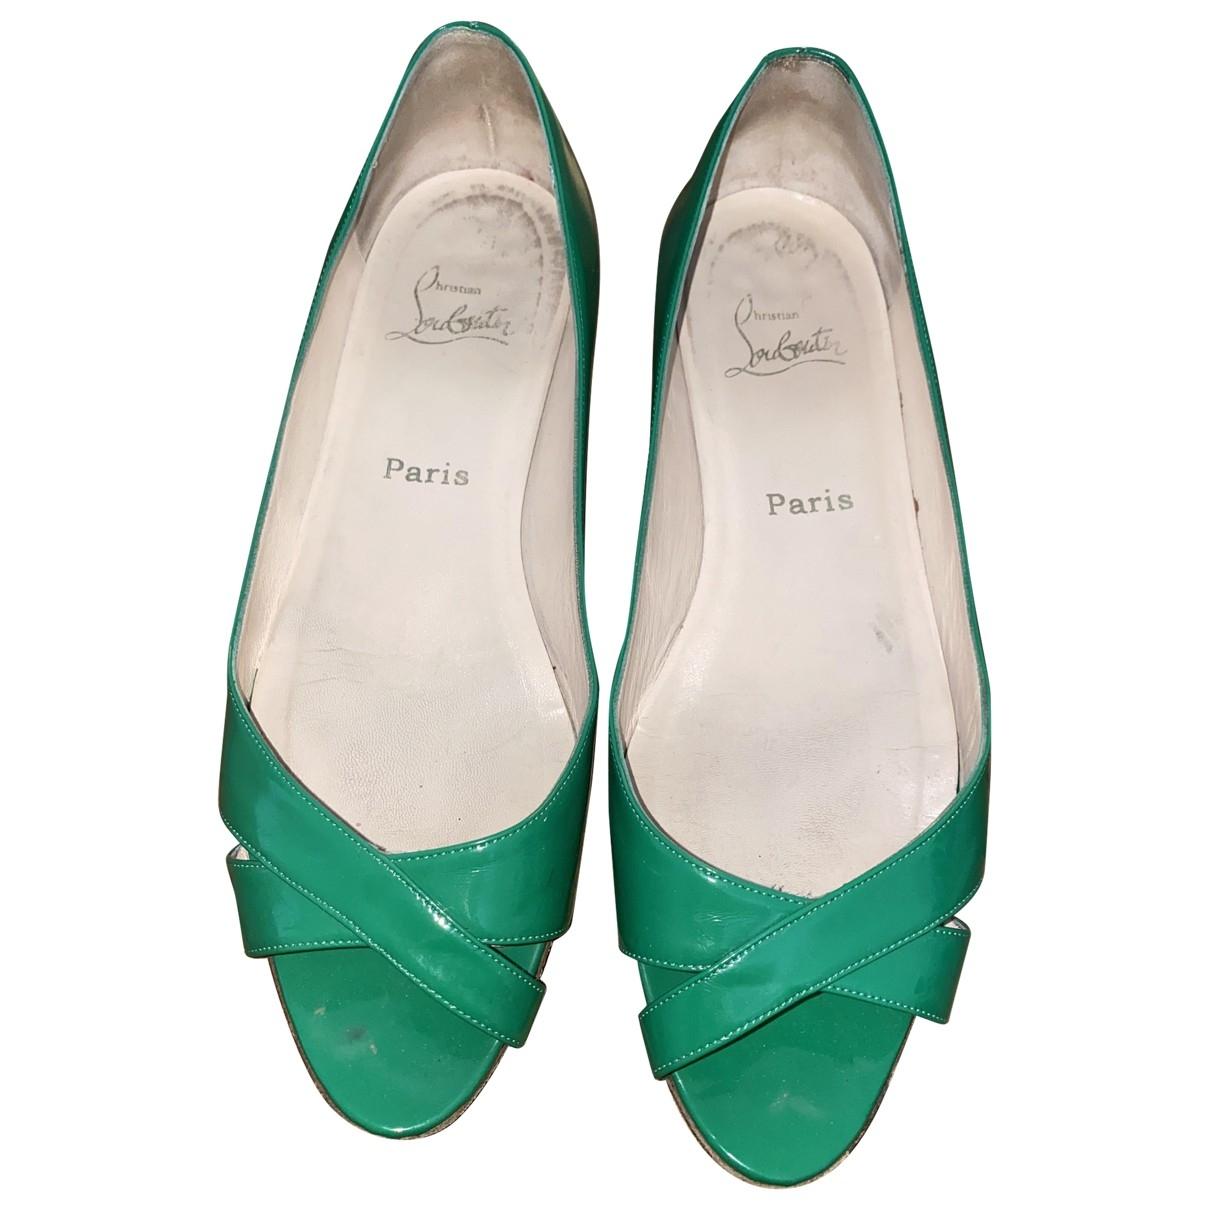 Christian Louboutin - Ballerines   pour femme en cuir verni - vert